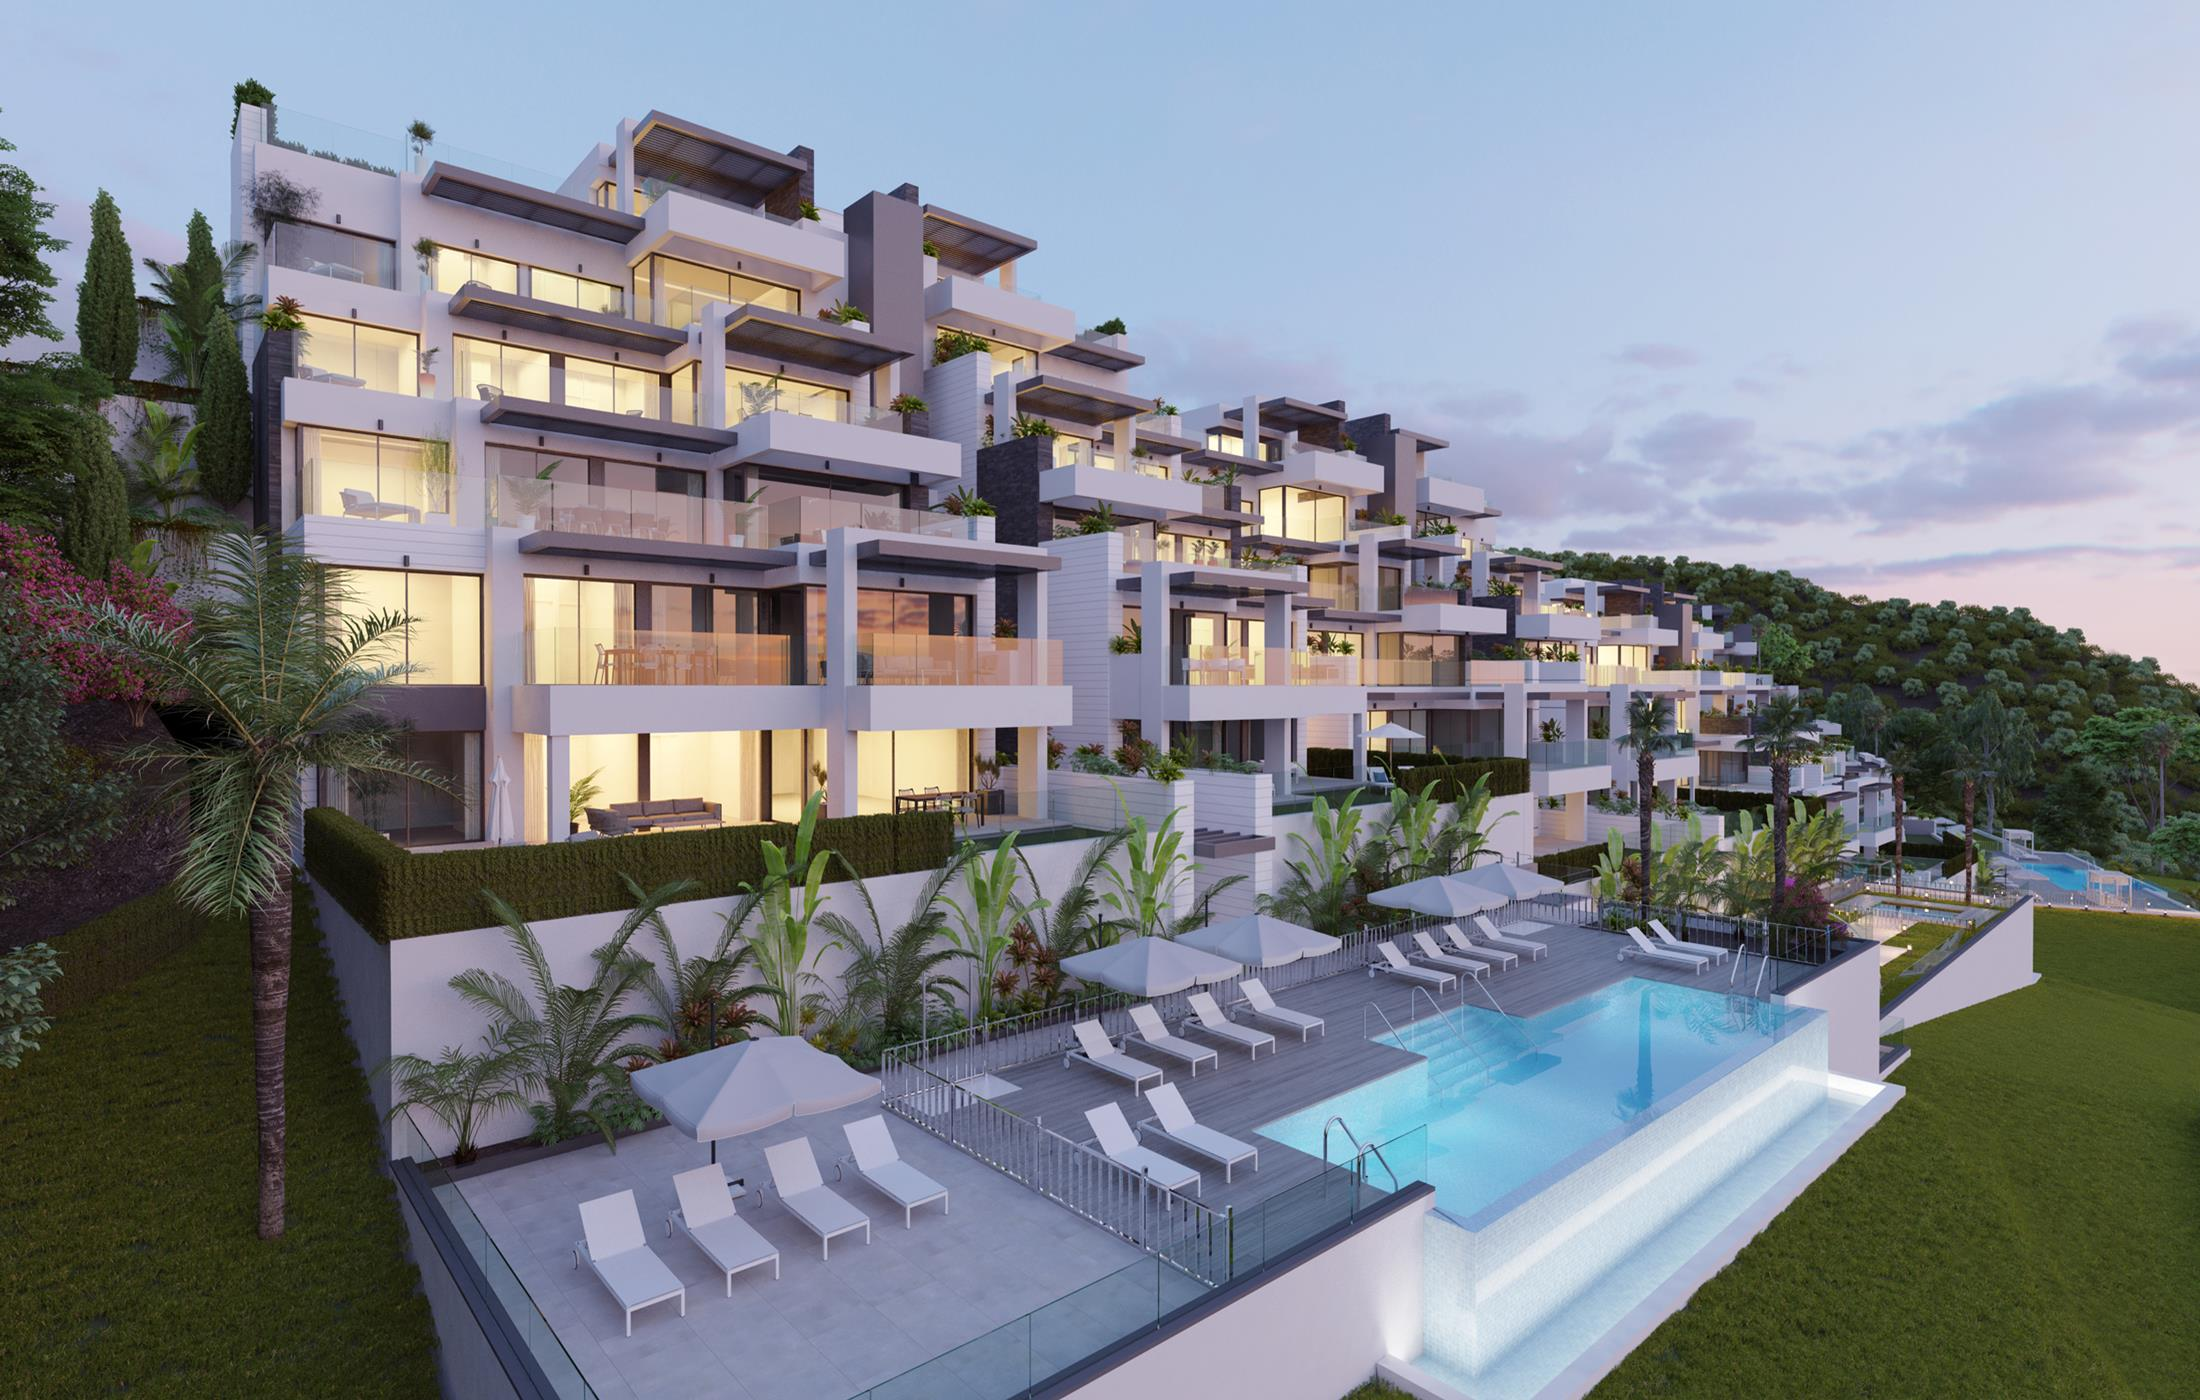 Residencial moderno de lujo en Benahavis.